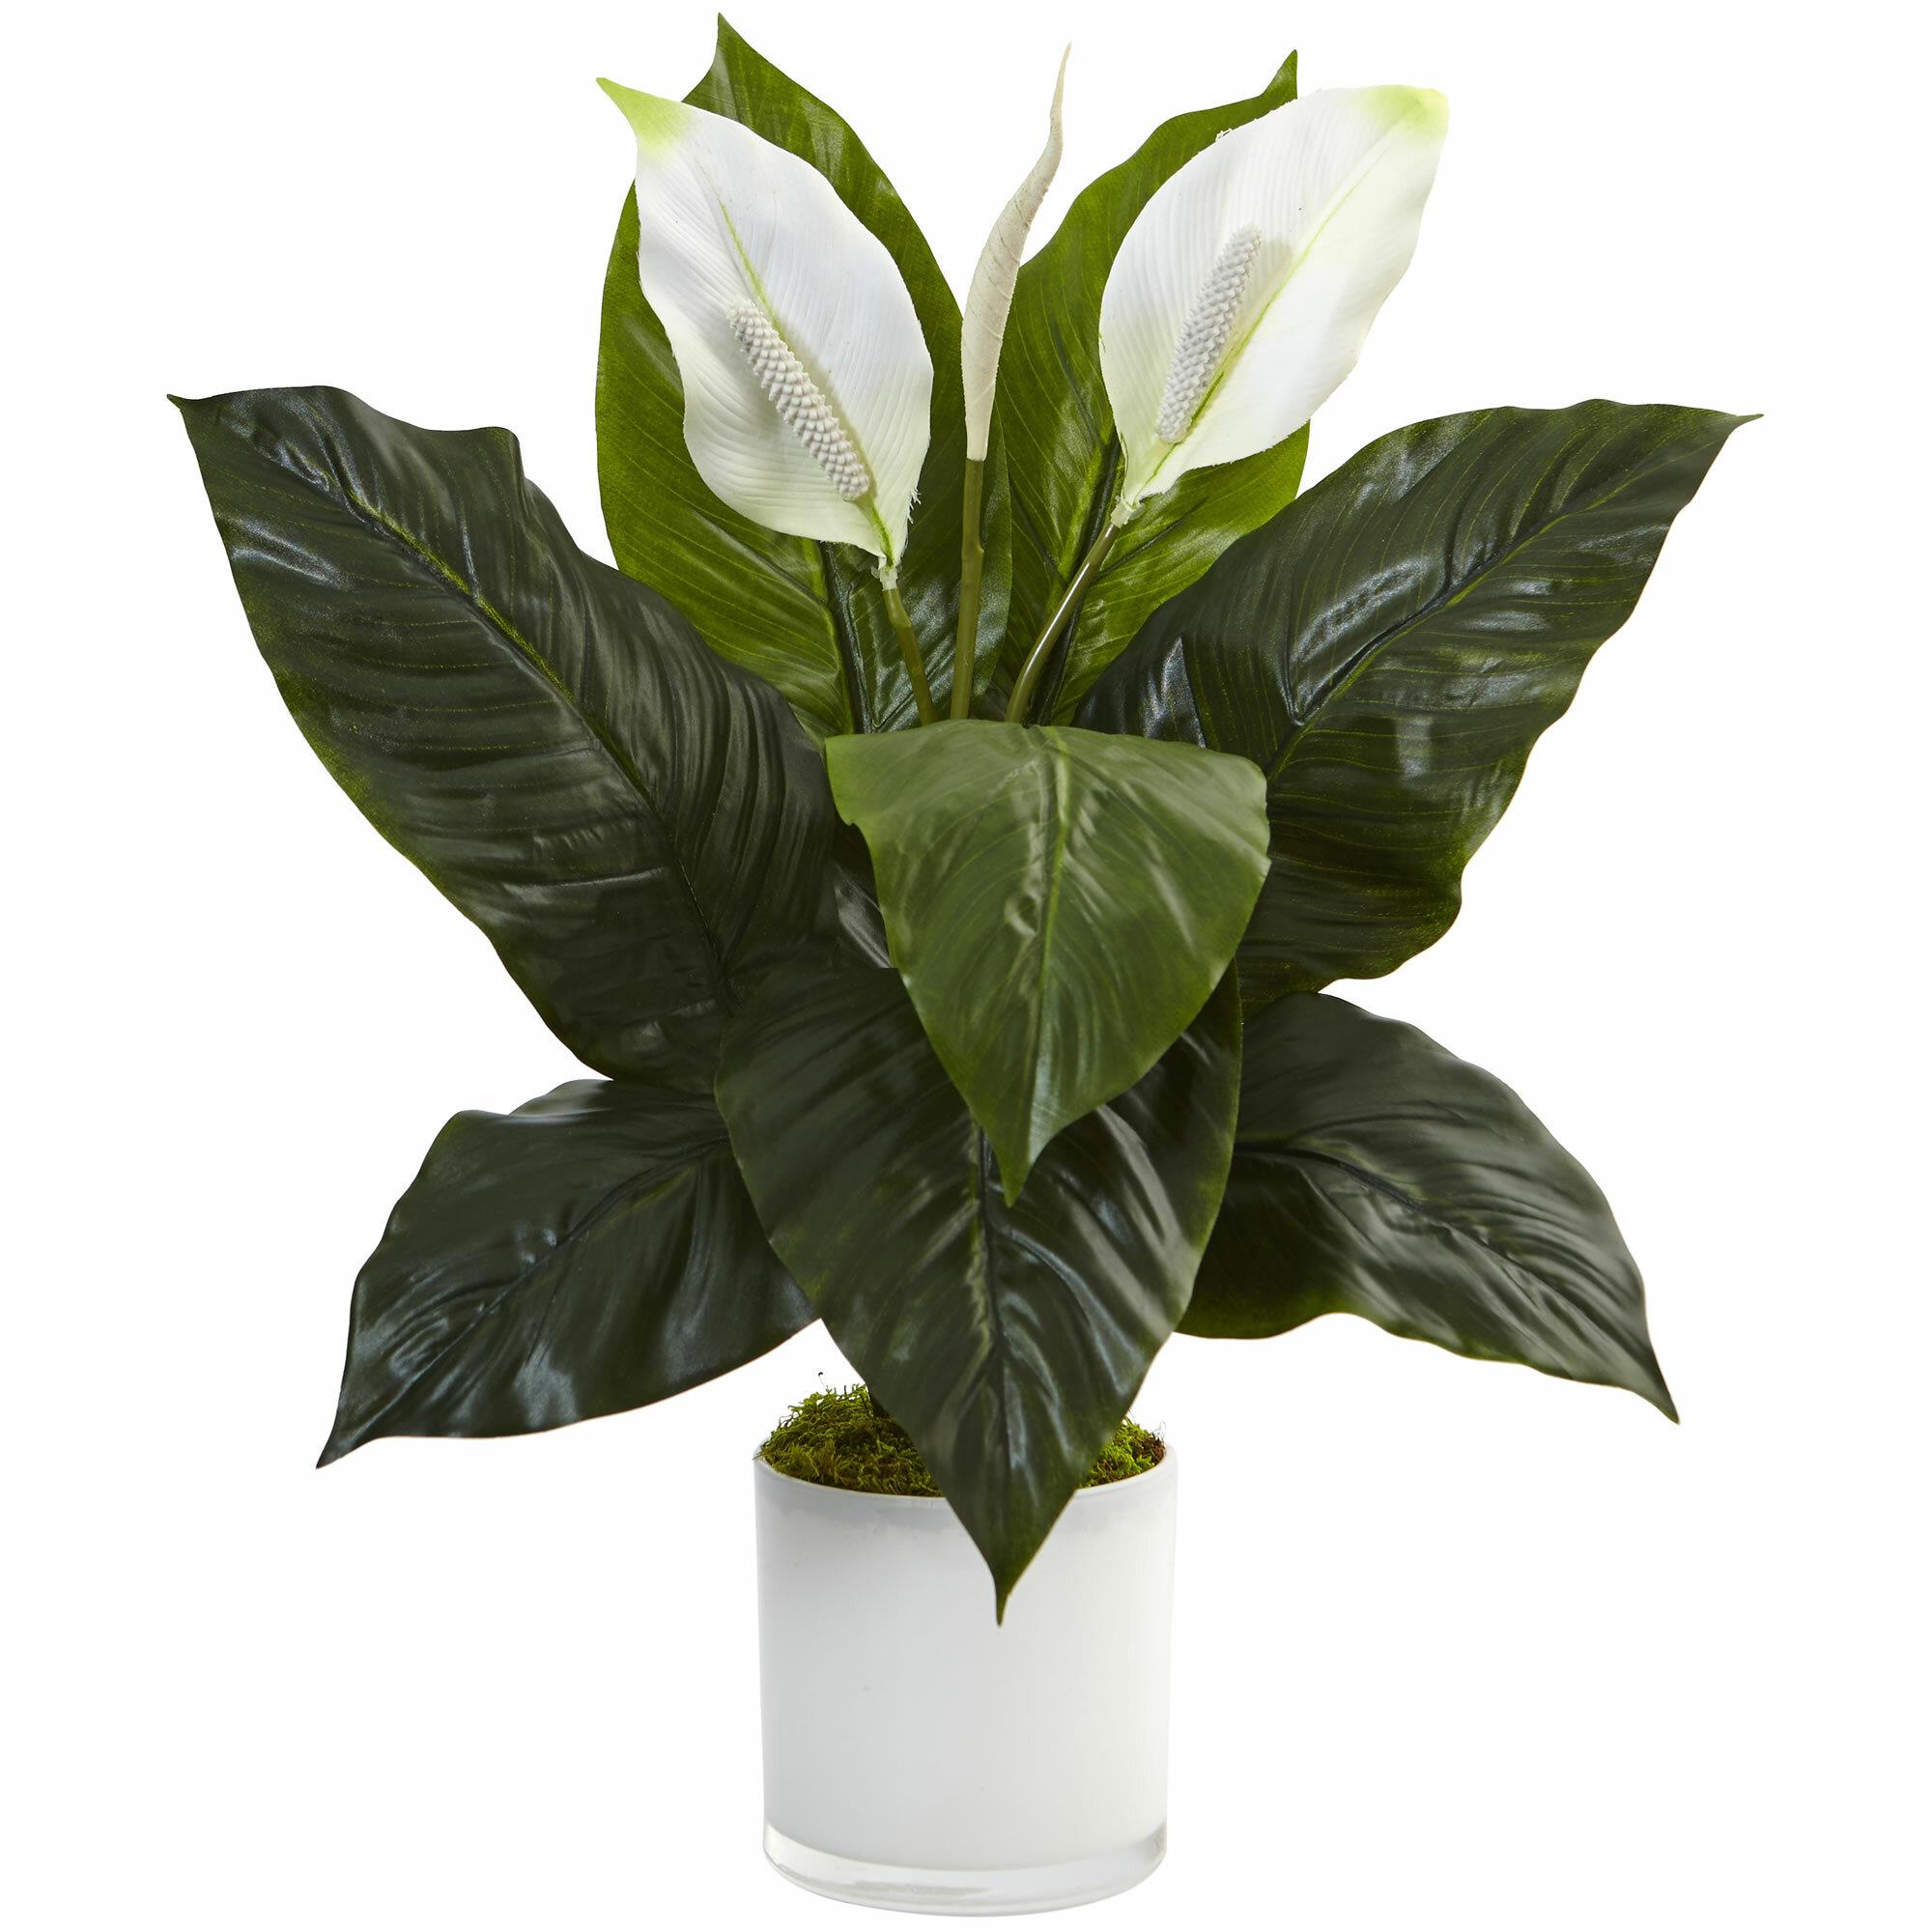 Orren Ellis Artificial Spathiphyllum Flowering Peace Lily Floral